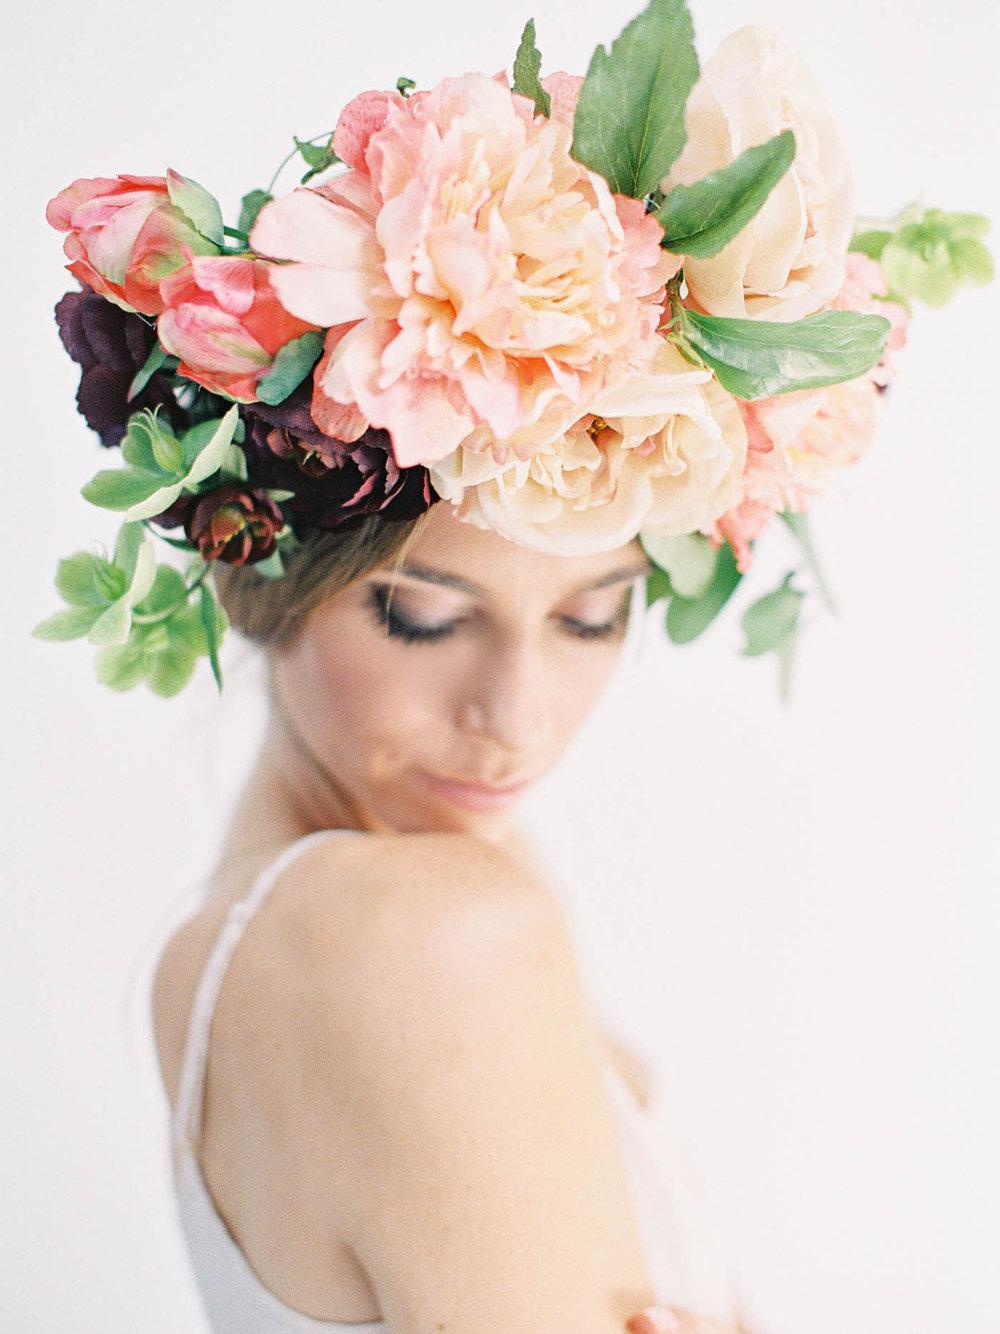 floral-crown-5-Jen_Huang-006839-R1-E020.jpg